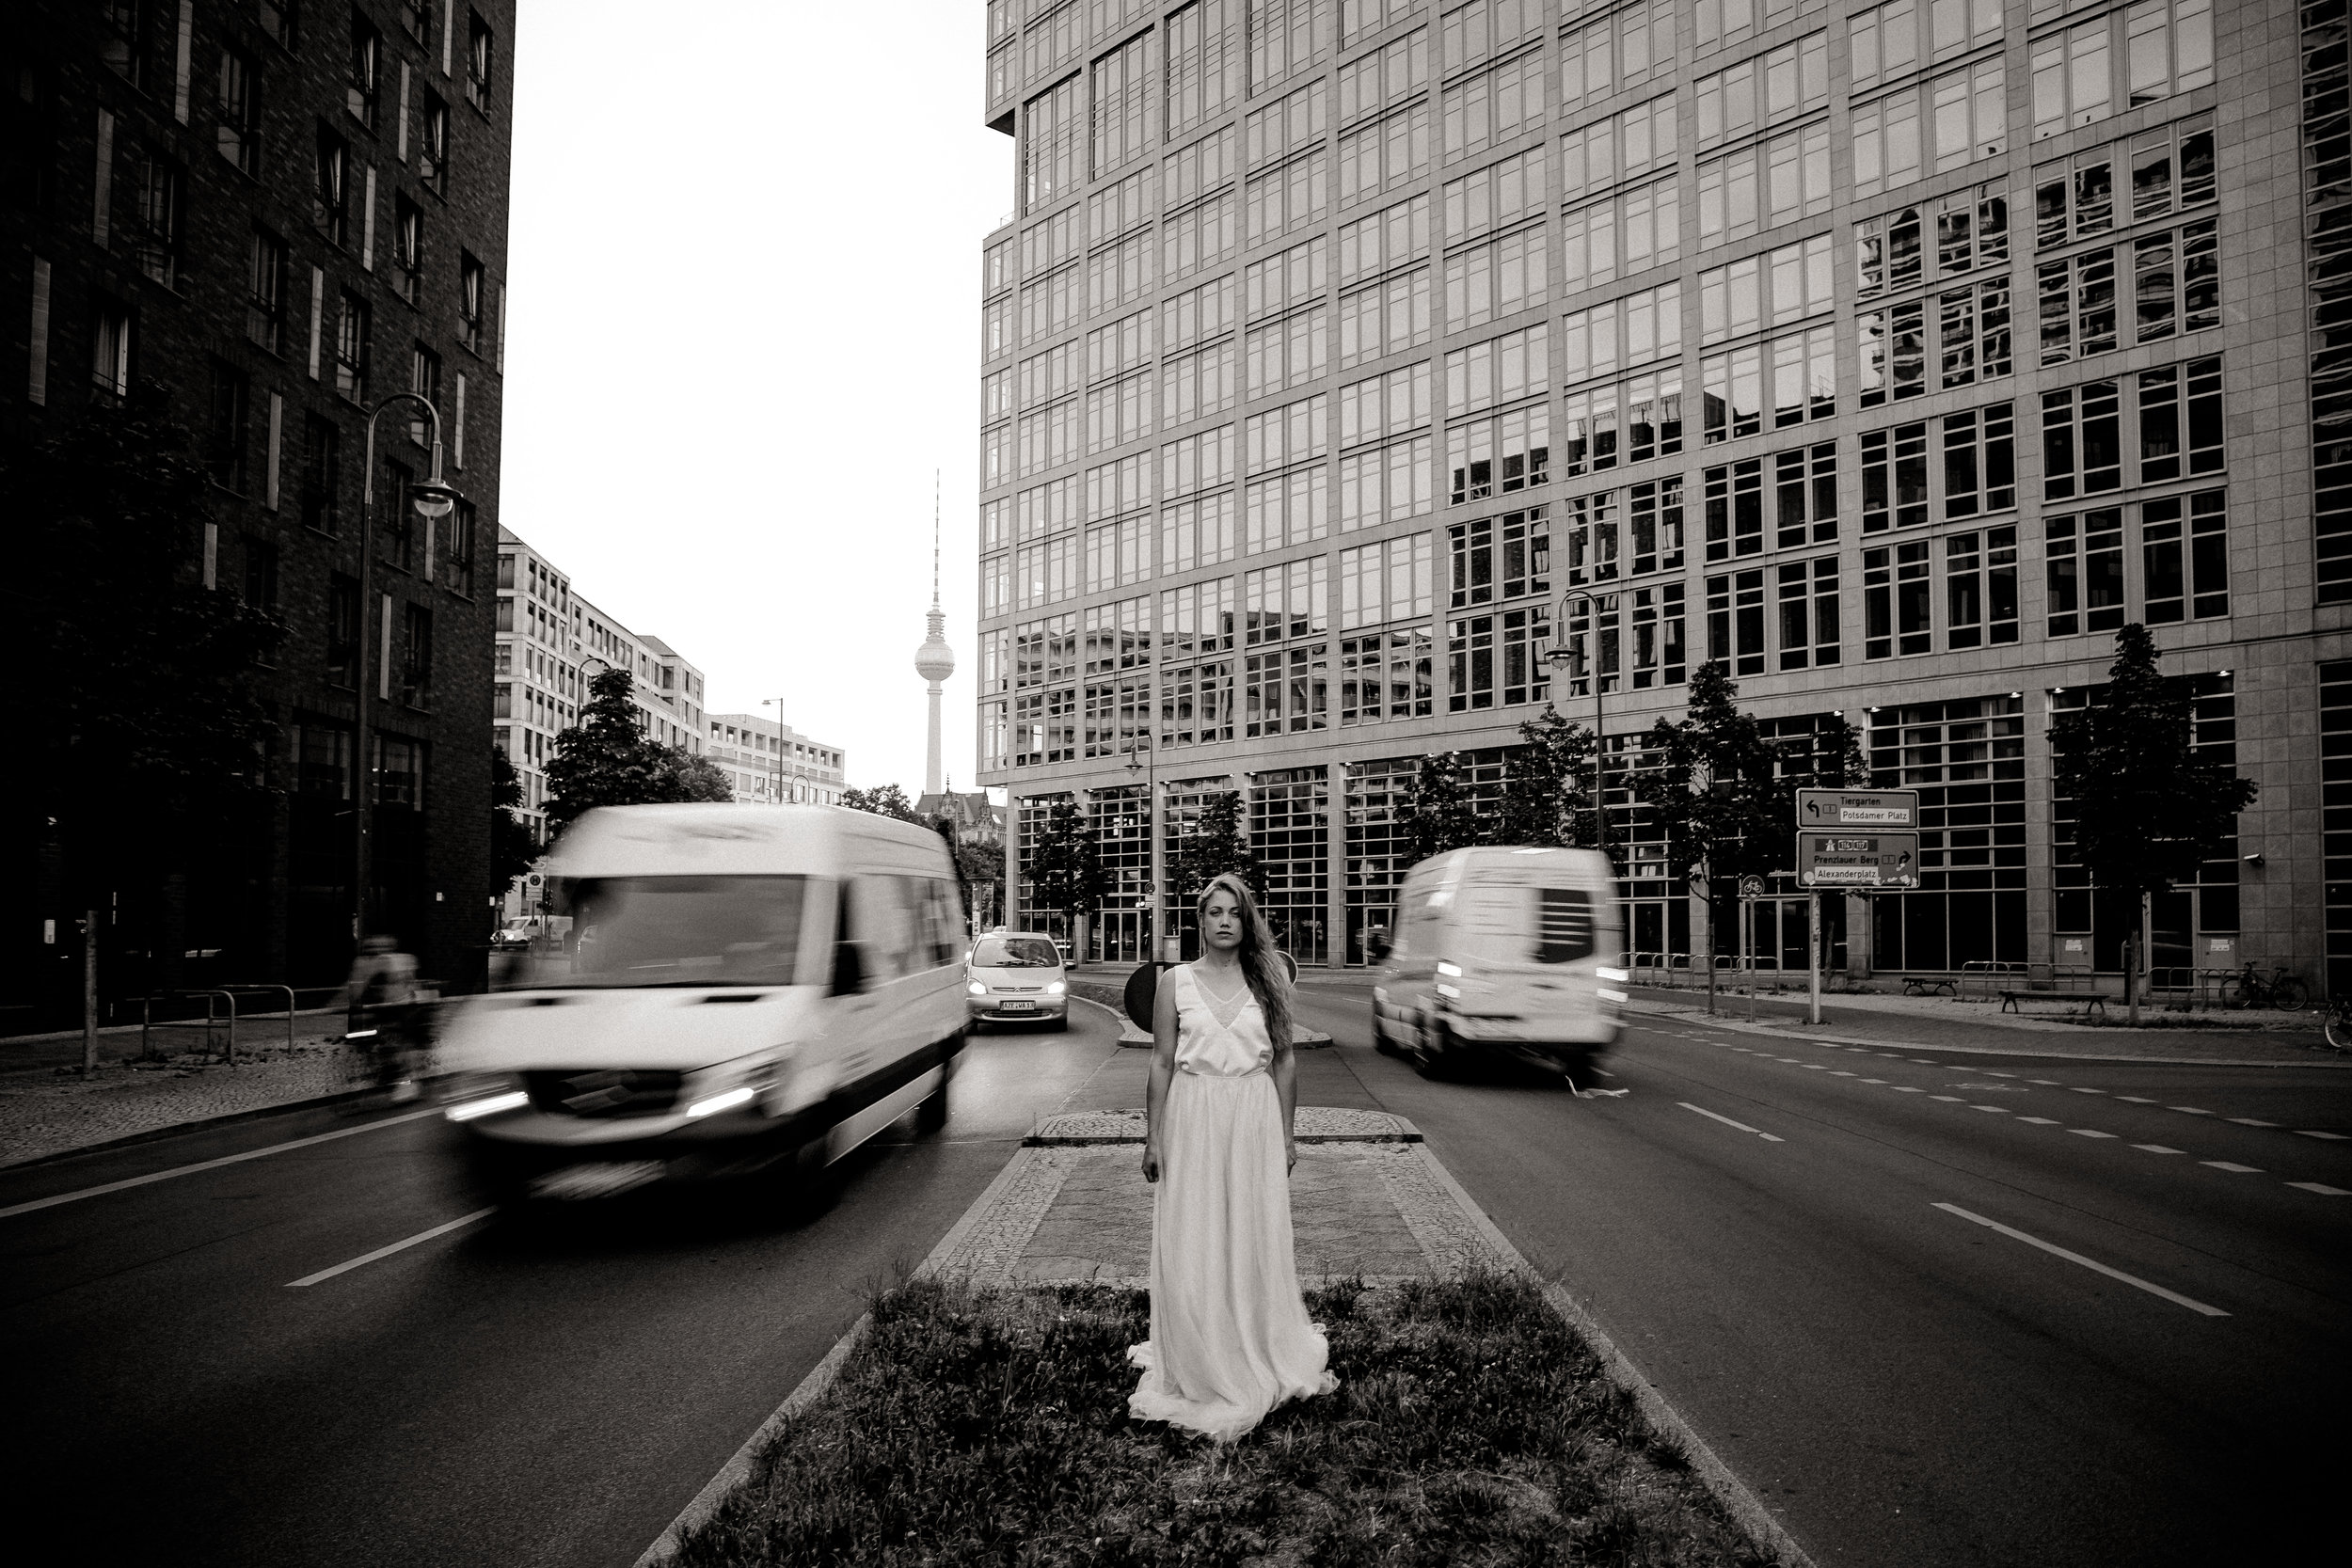 Hues of Vintage-Berlin-Katharina-full res-31.jpg